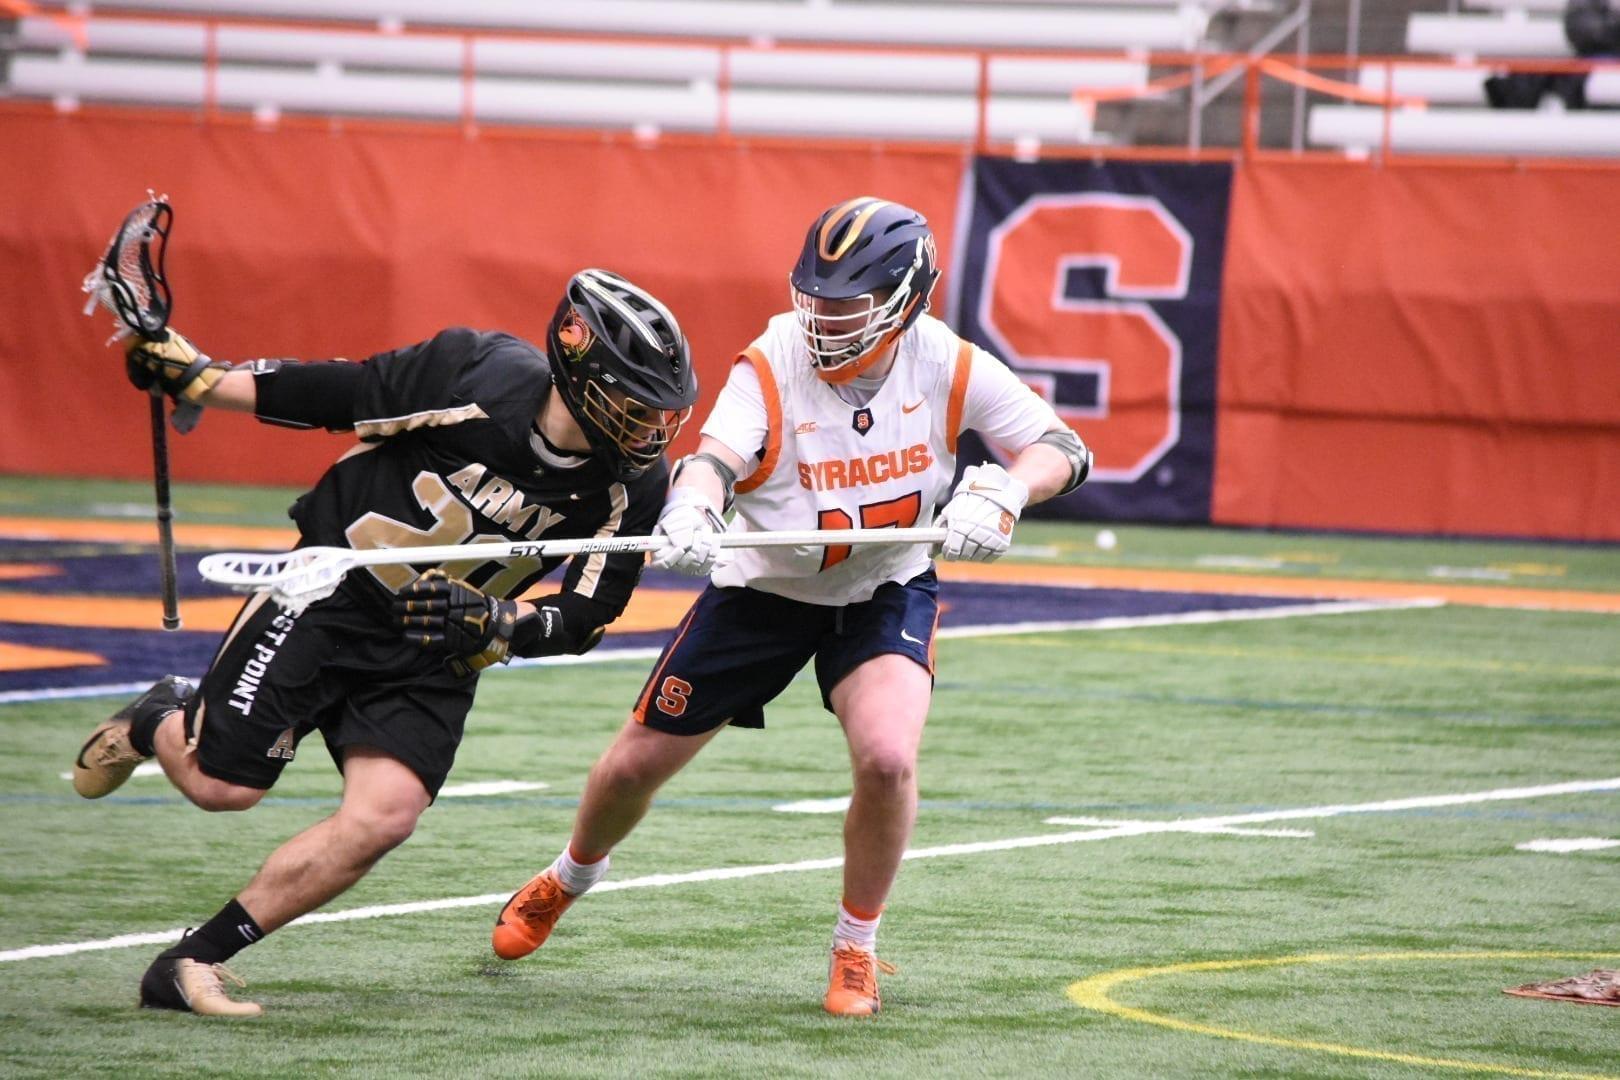 syracuse orange army black knights ncaa d1 college lacrosse 2020